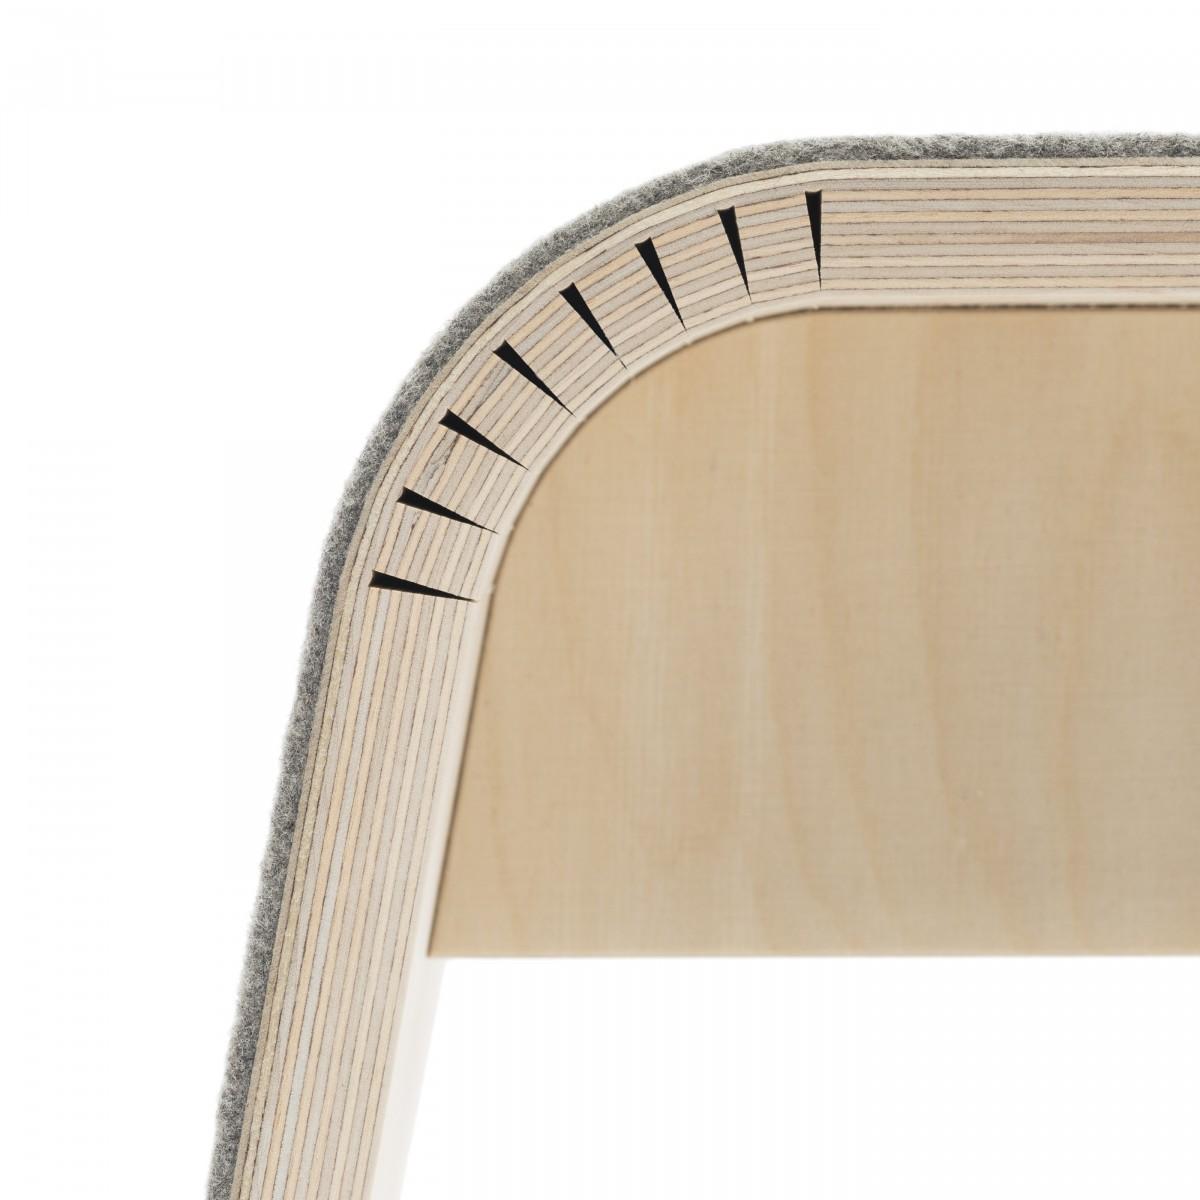 STADIG.stubenbank Design Sitzbank aus Holz mit Wollfilz